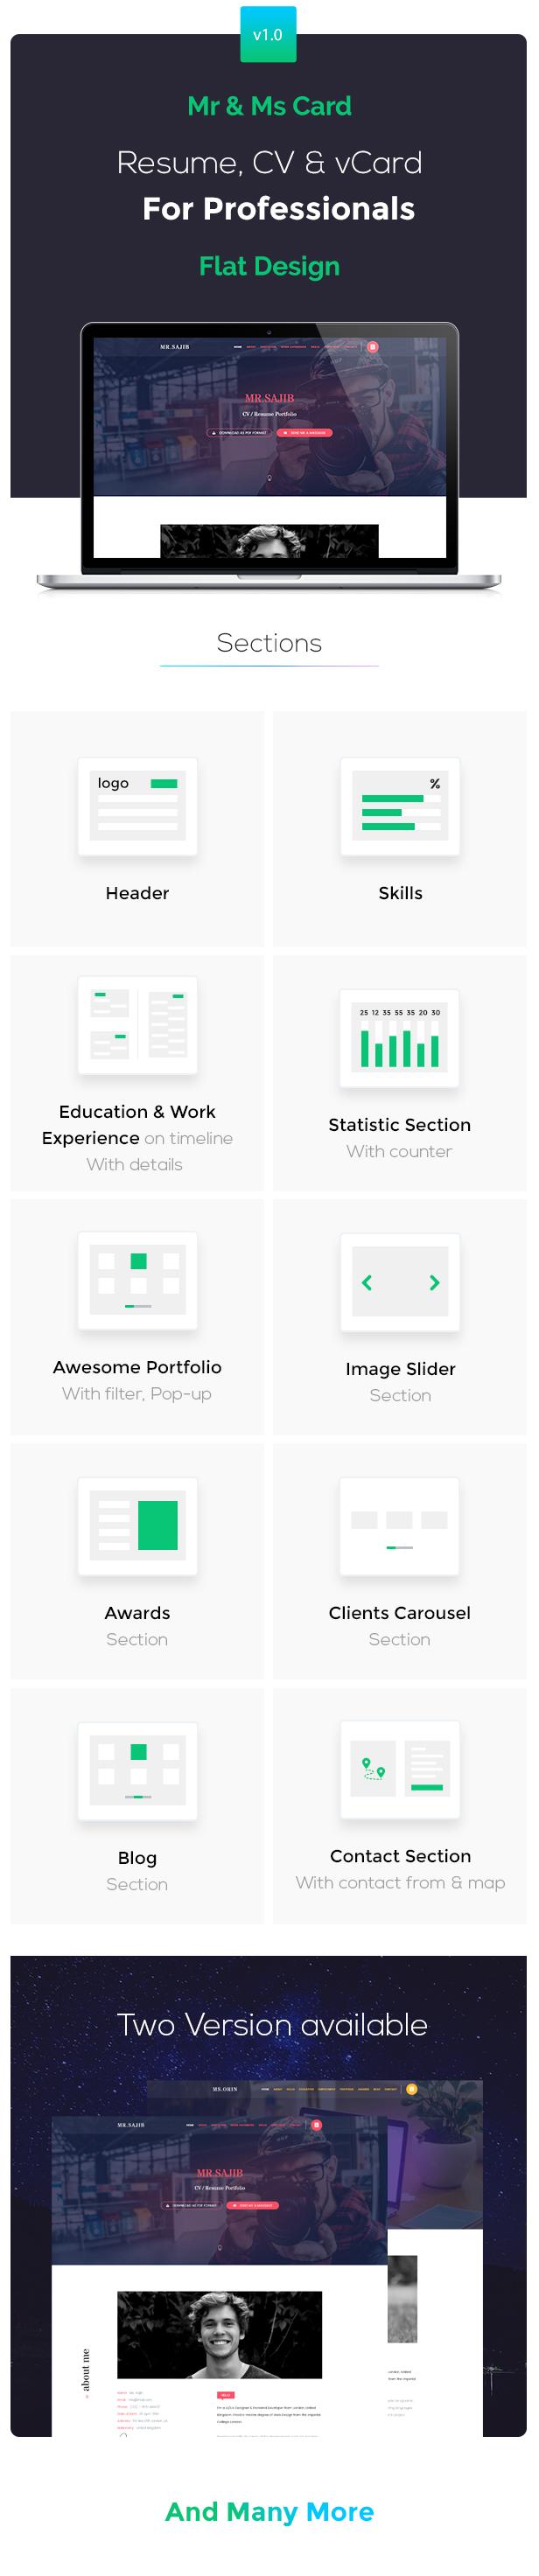 Creative Cv / Resume / Card HTML5 Template - 1